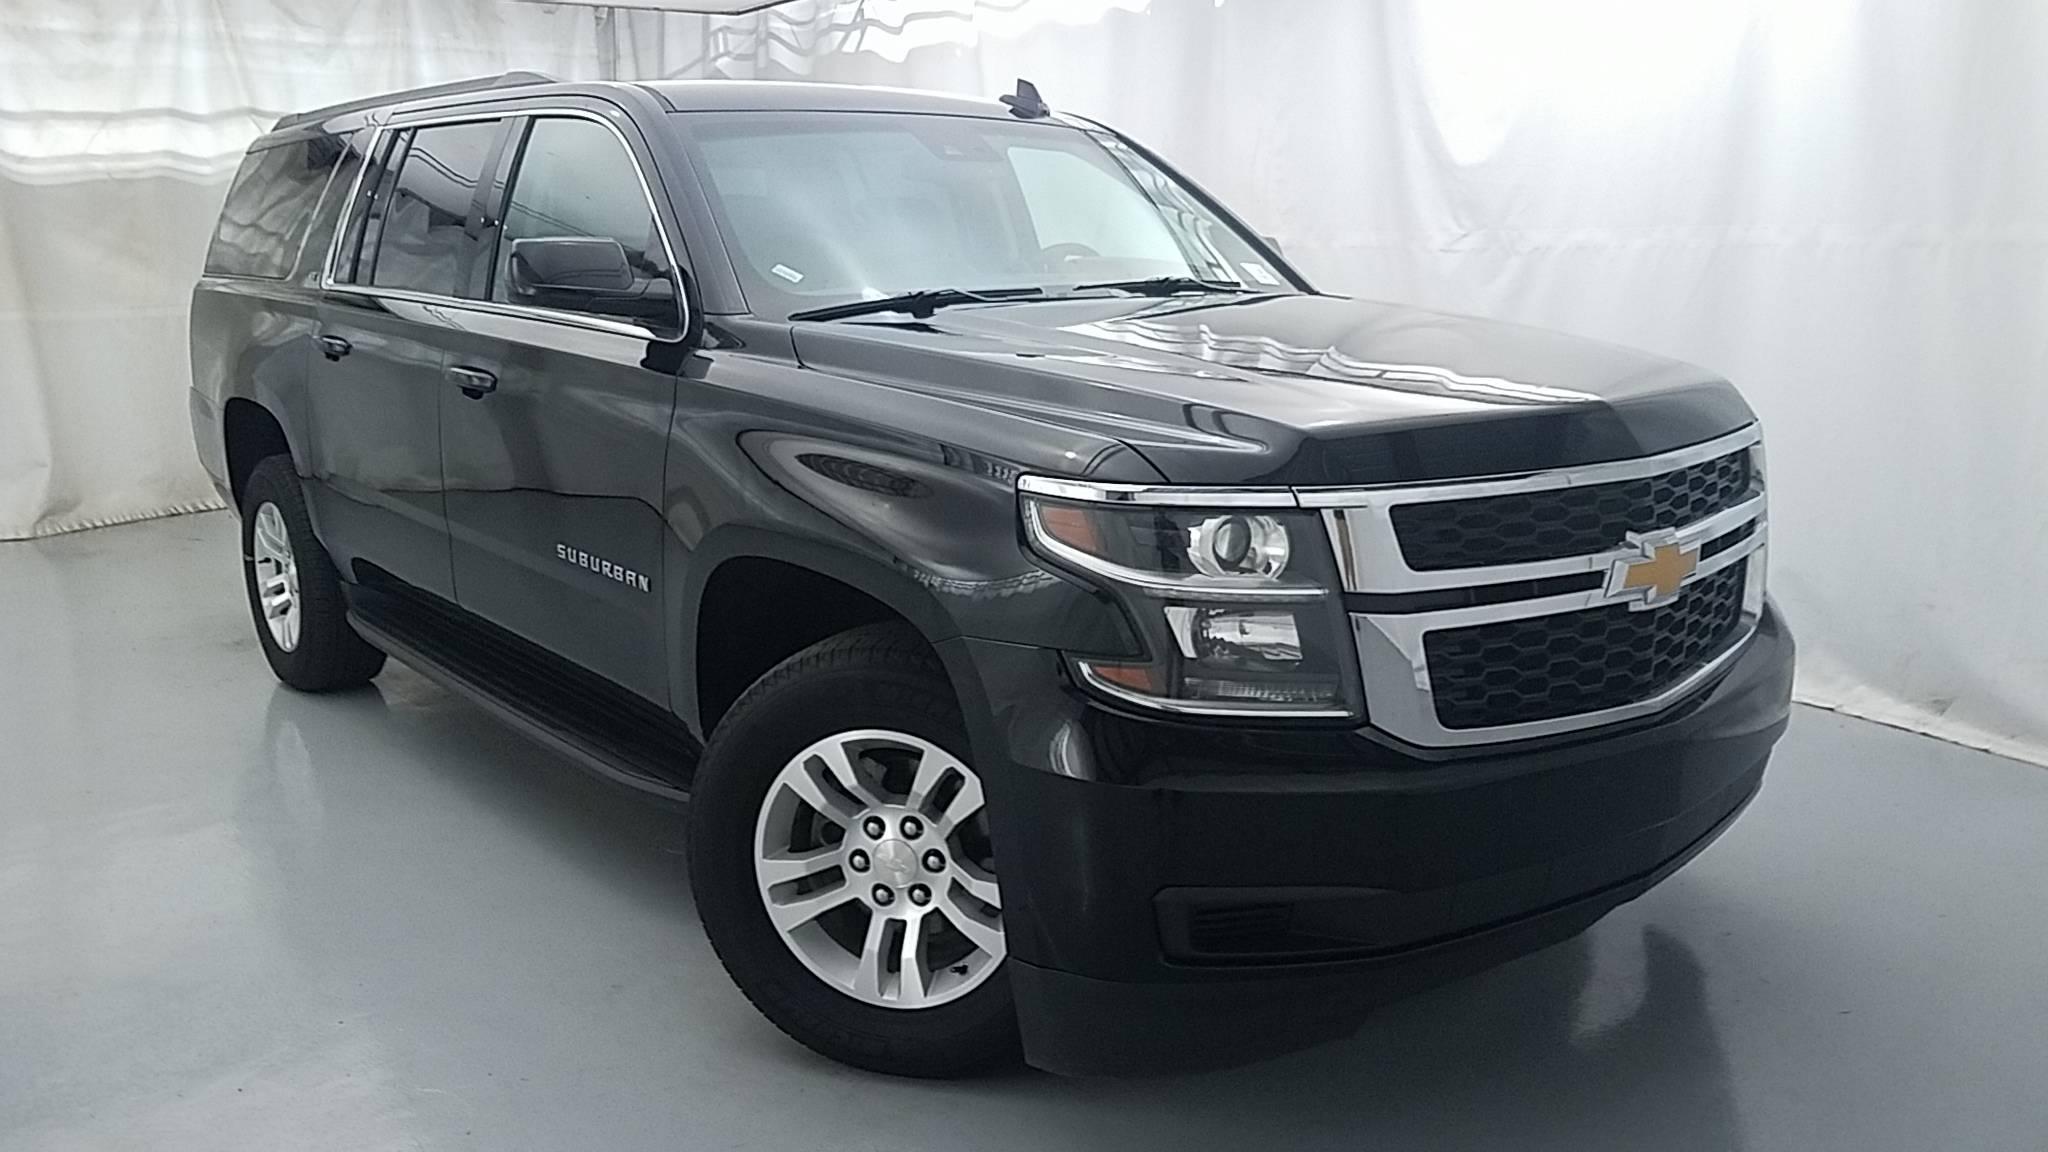 2017 Chevrolet Lacrosse Vehicles For Sale Near Hammond New Orleans